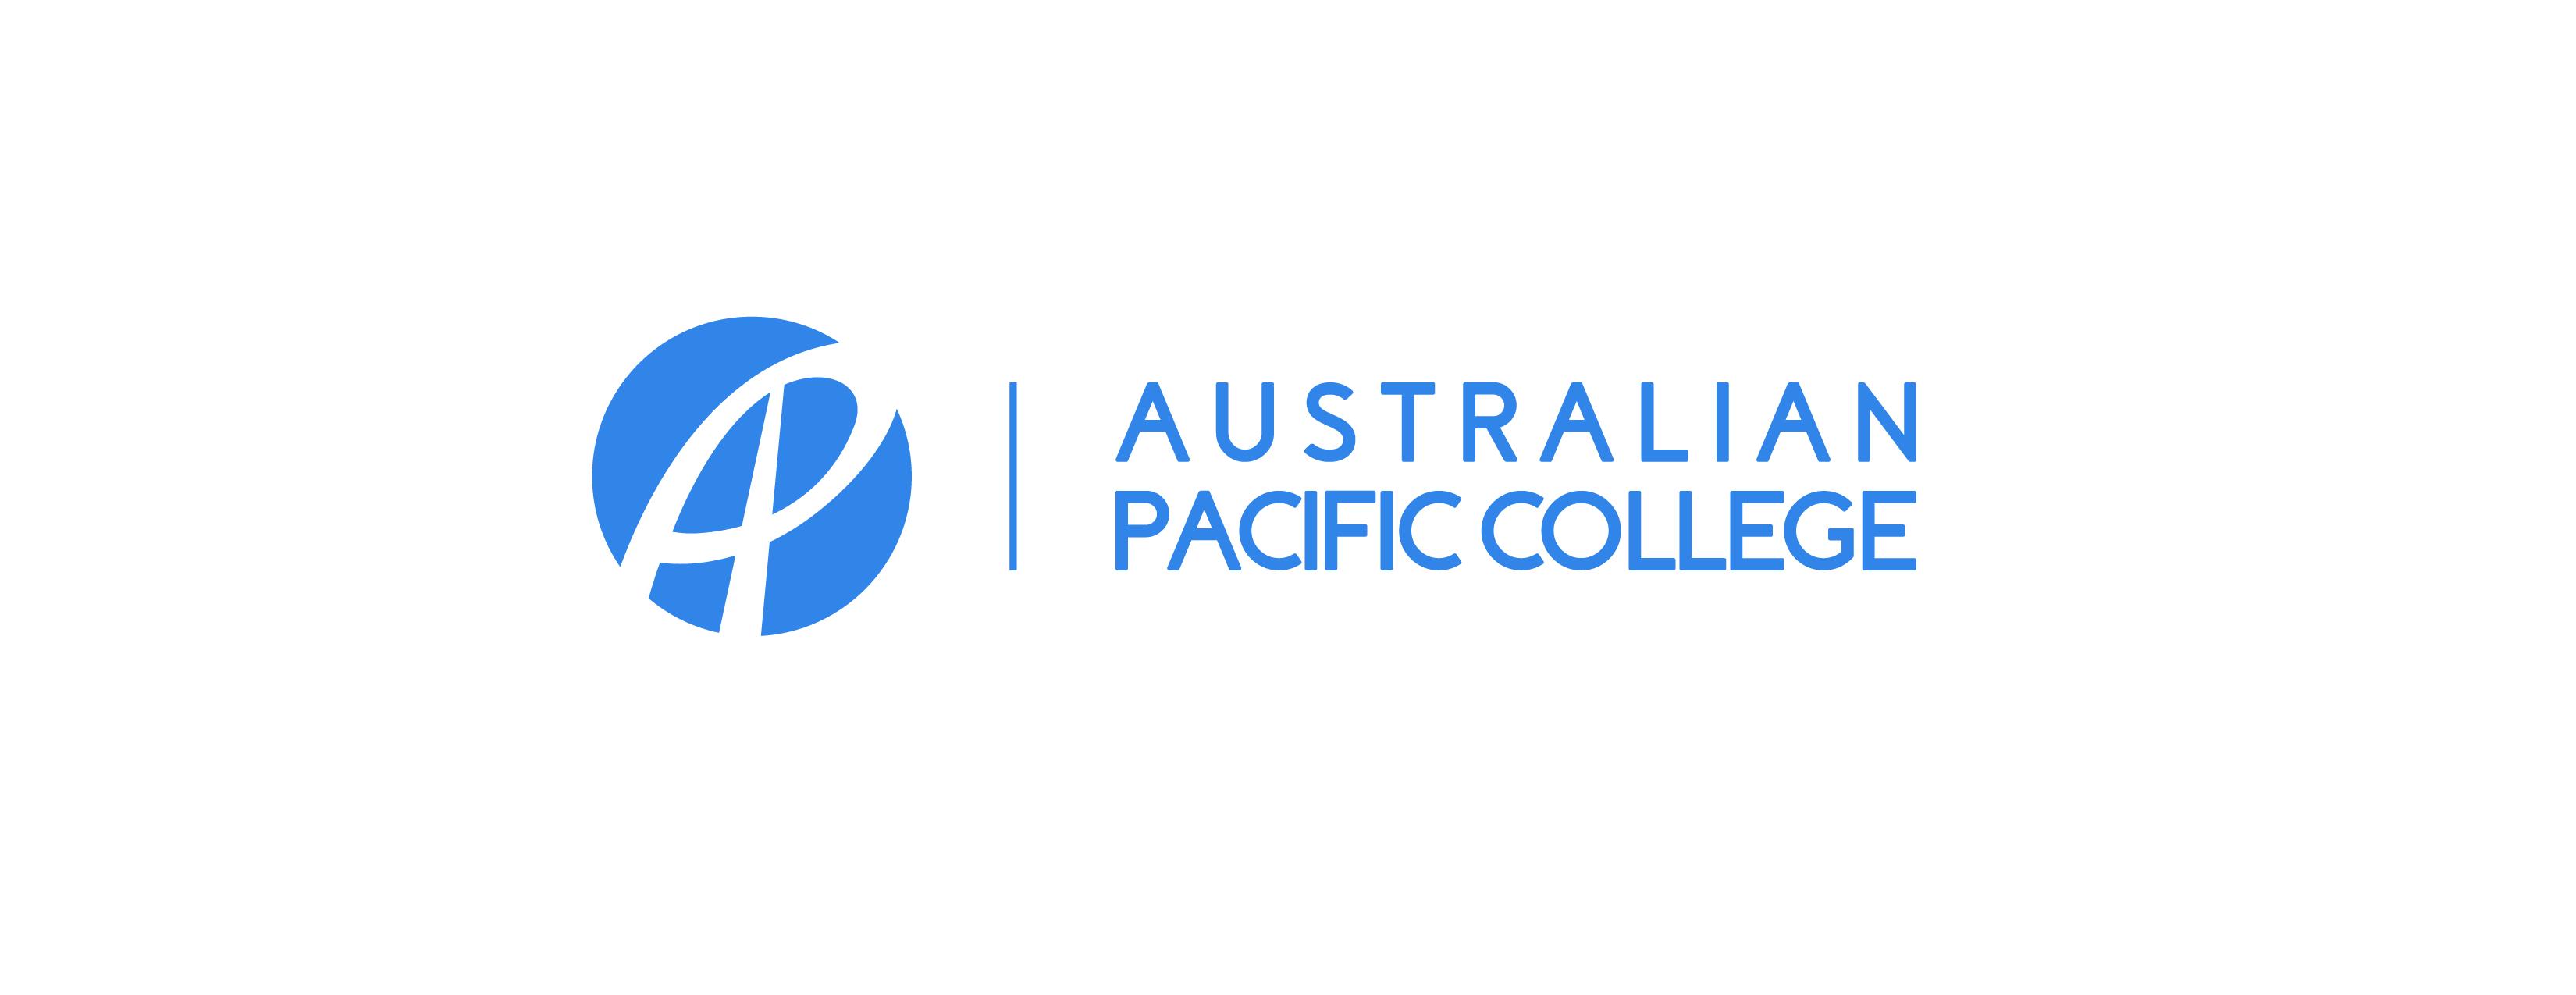 Australian Pacific College - Sydney (Kent Street)